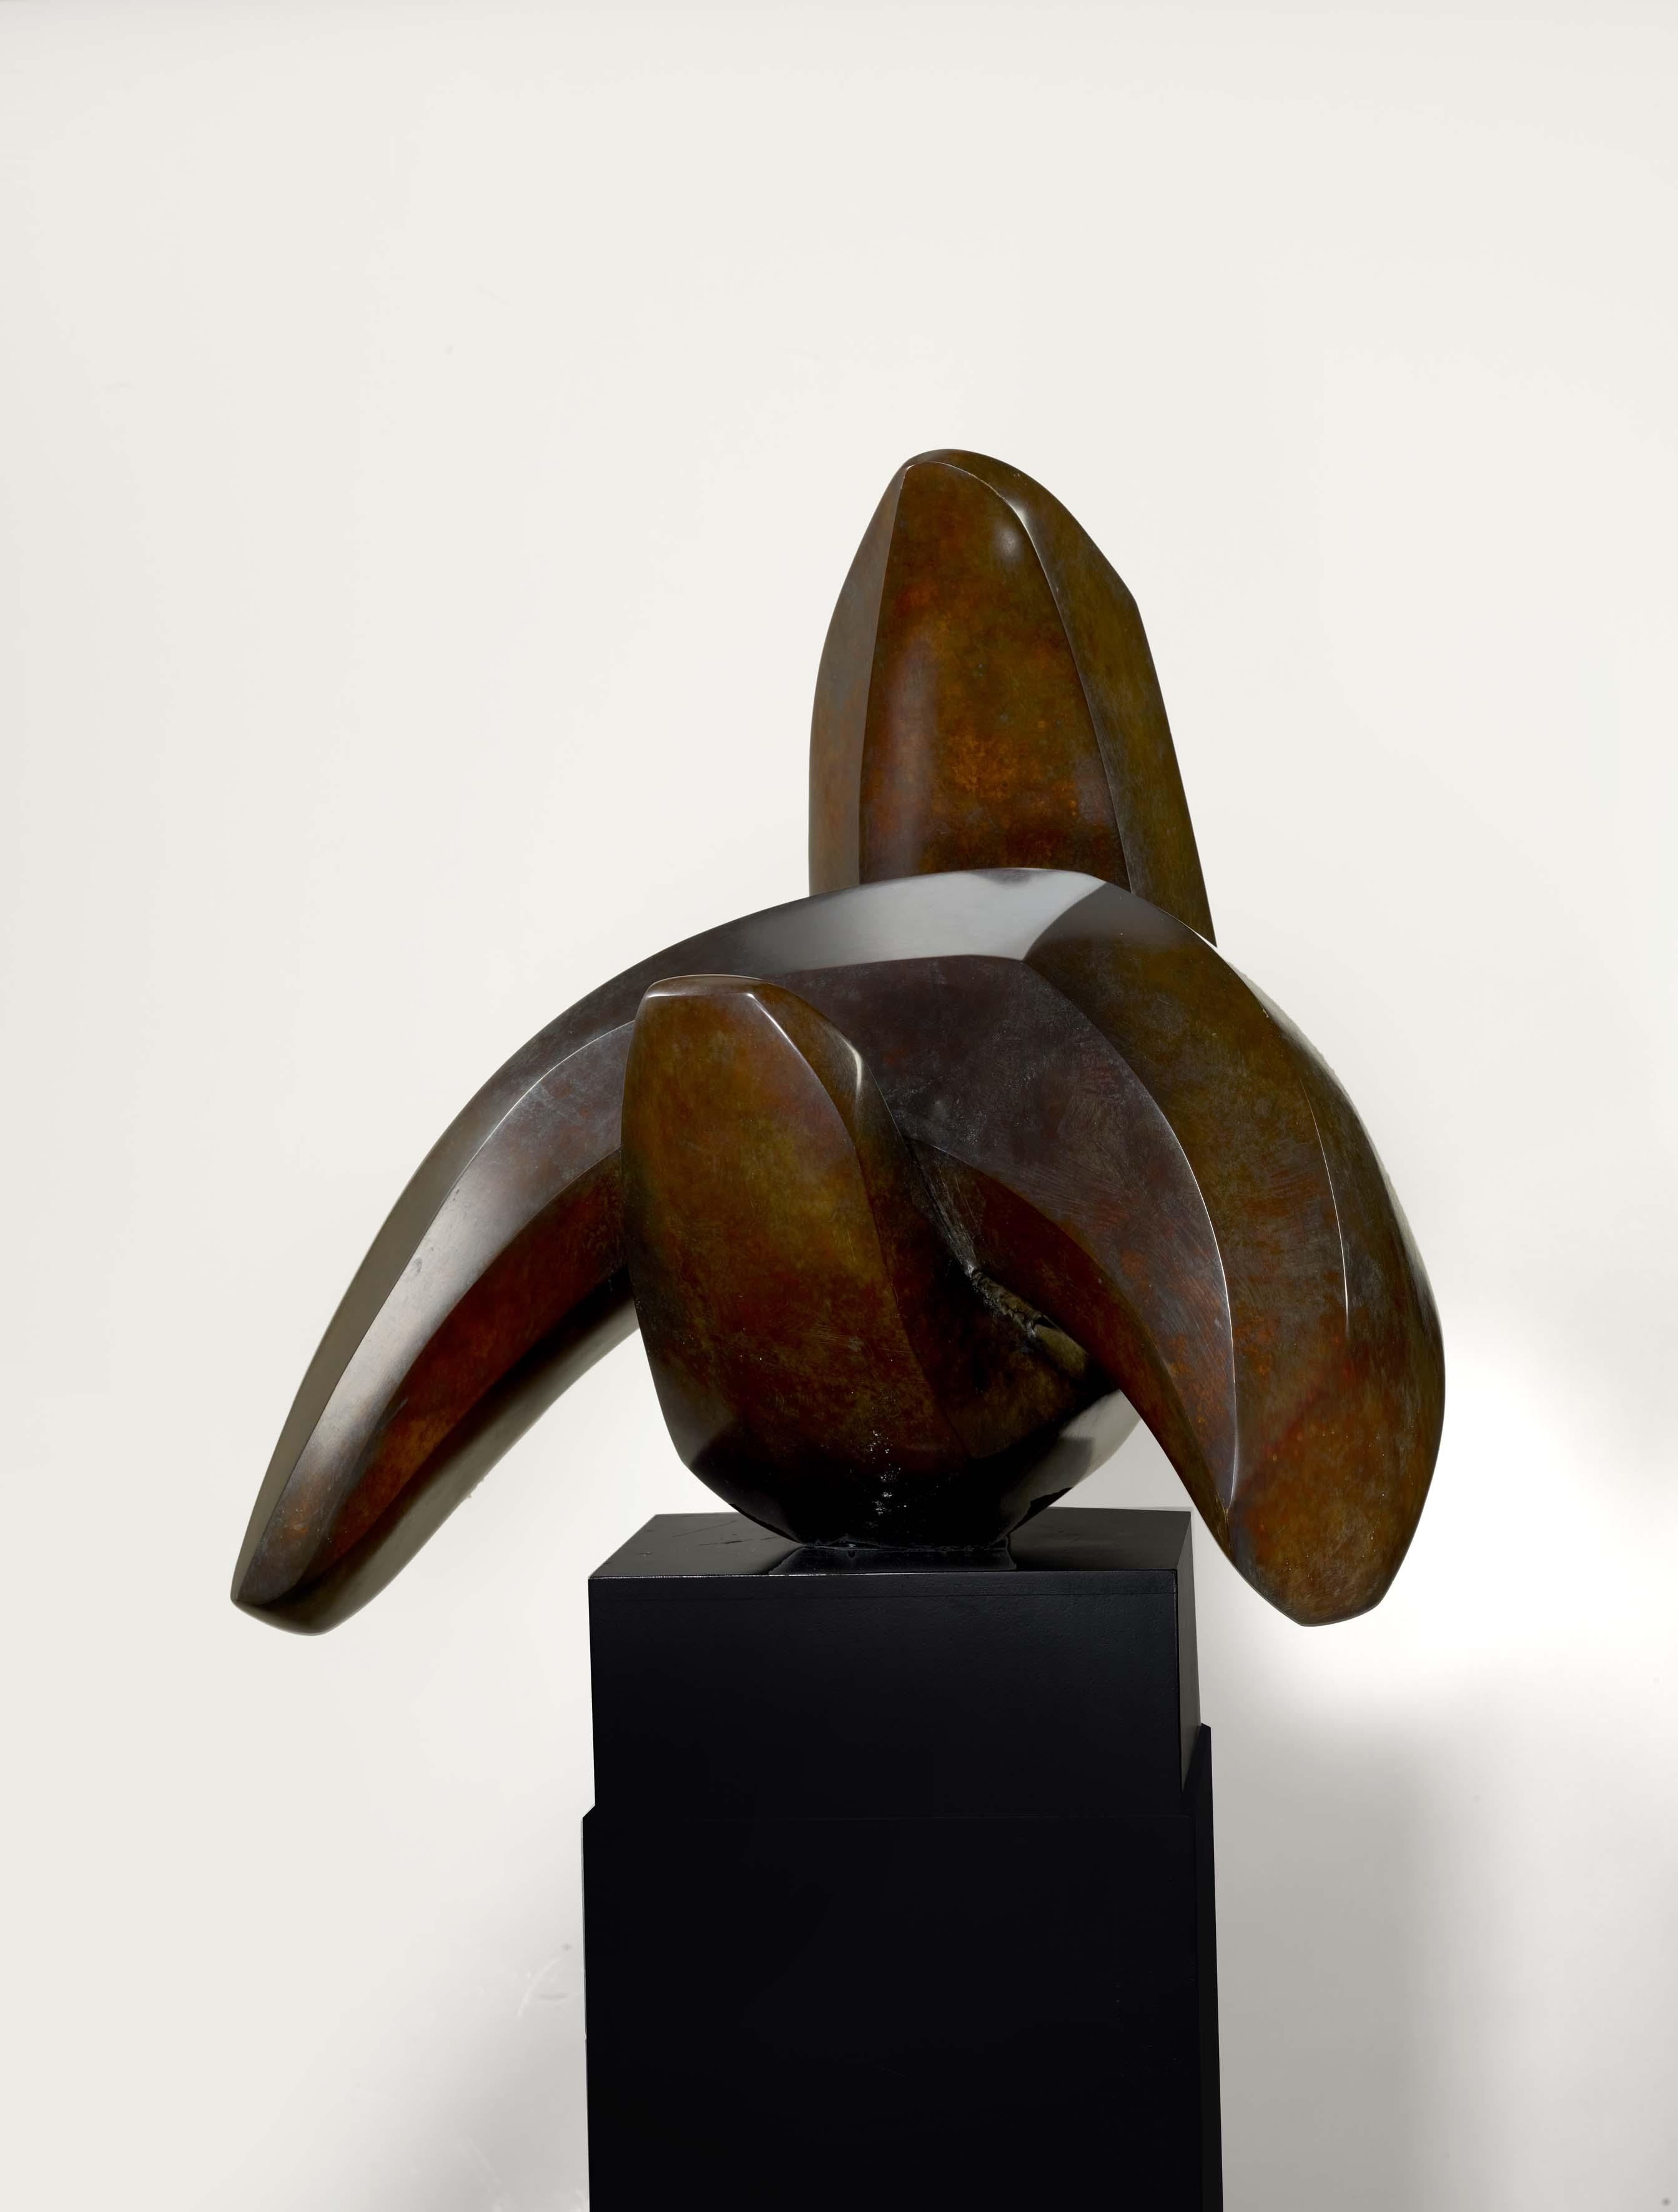 Pietà, 2006, 46 x 48 x 39 cm